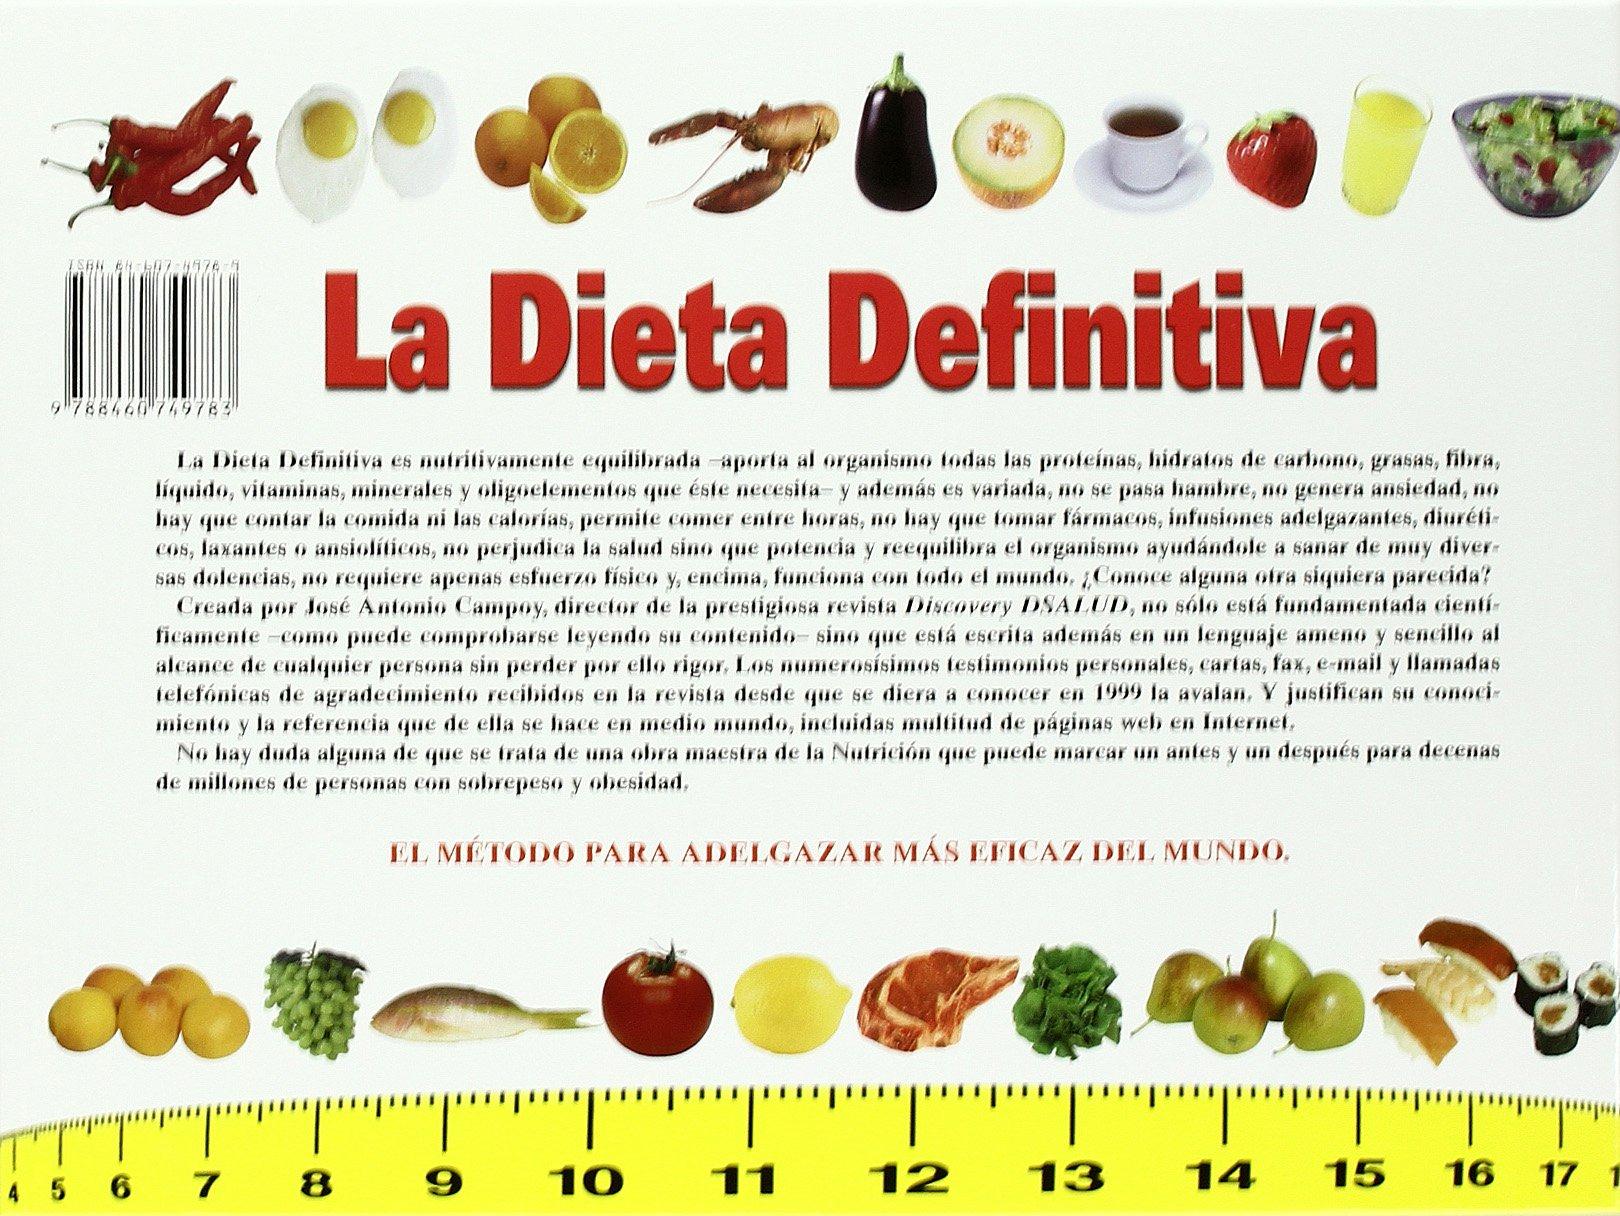 La dieta definitiva: José Antonio Campoy Sanz-Orrio: 9788460749783: Amazon.com: Books